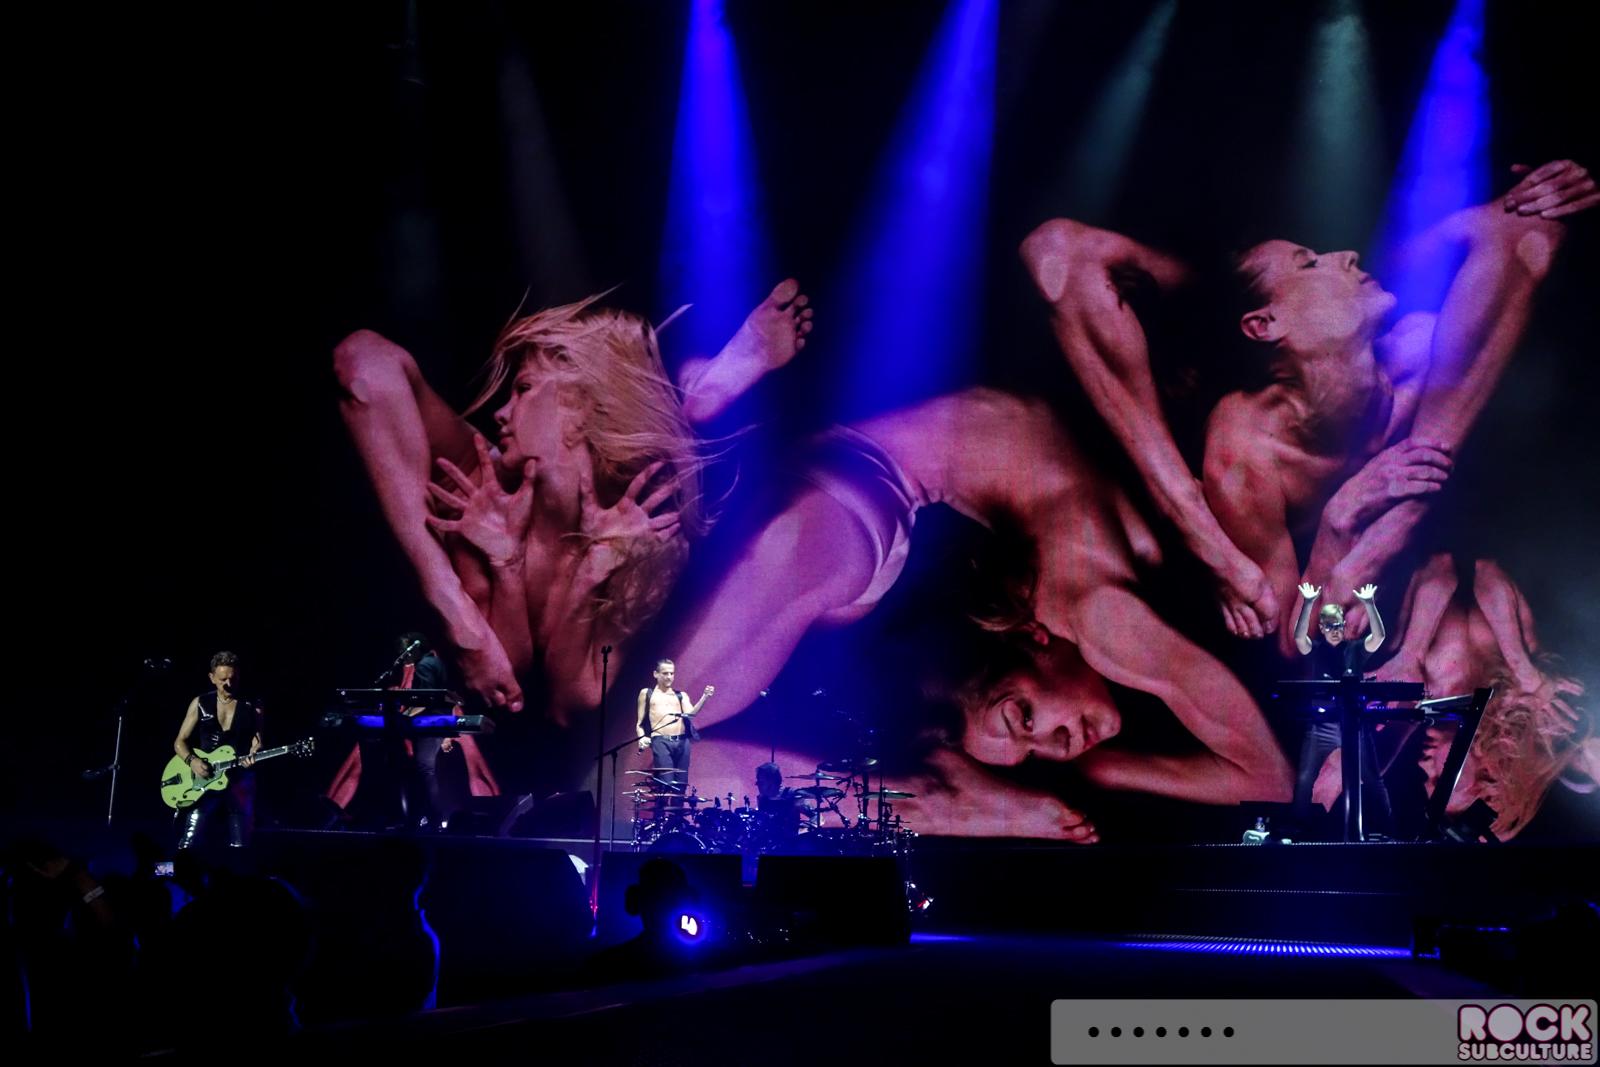 Depeche Mode Delta Machine Tour European Leg At The O2 Arena London London England 5 29